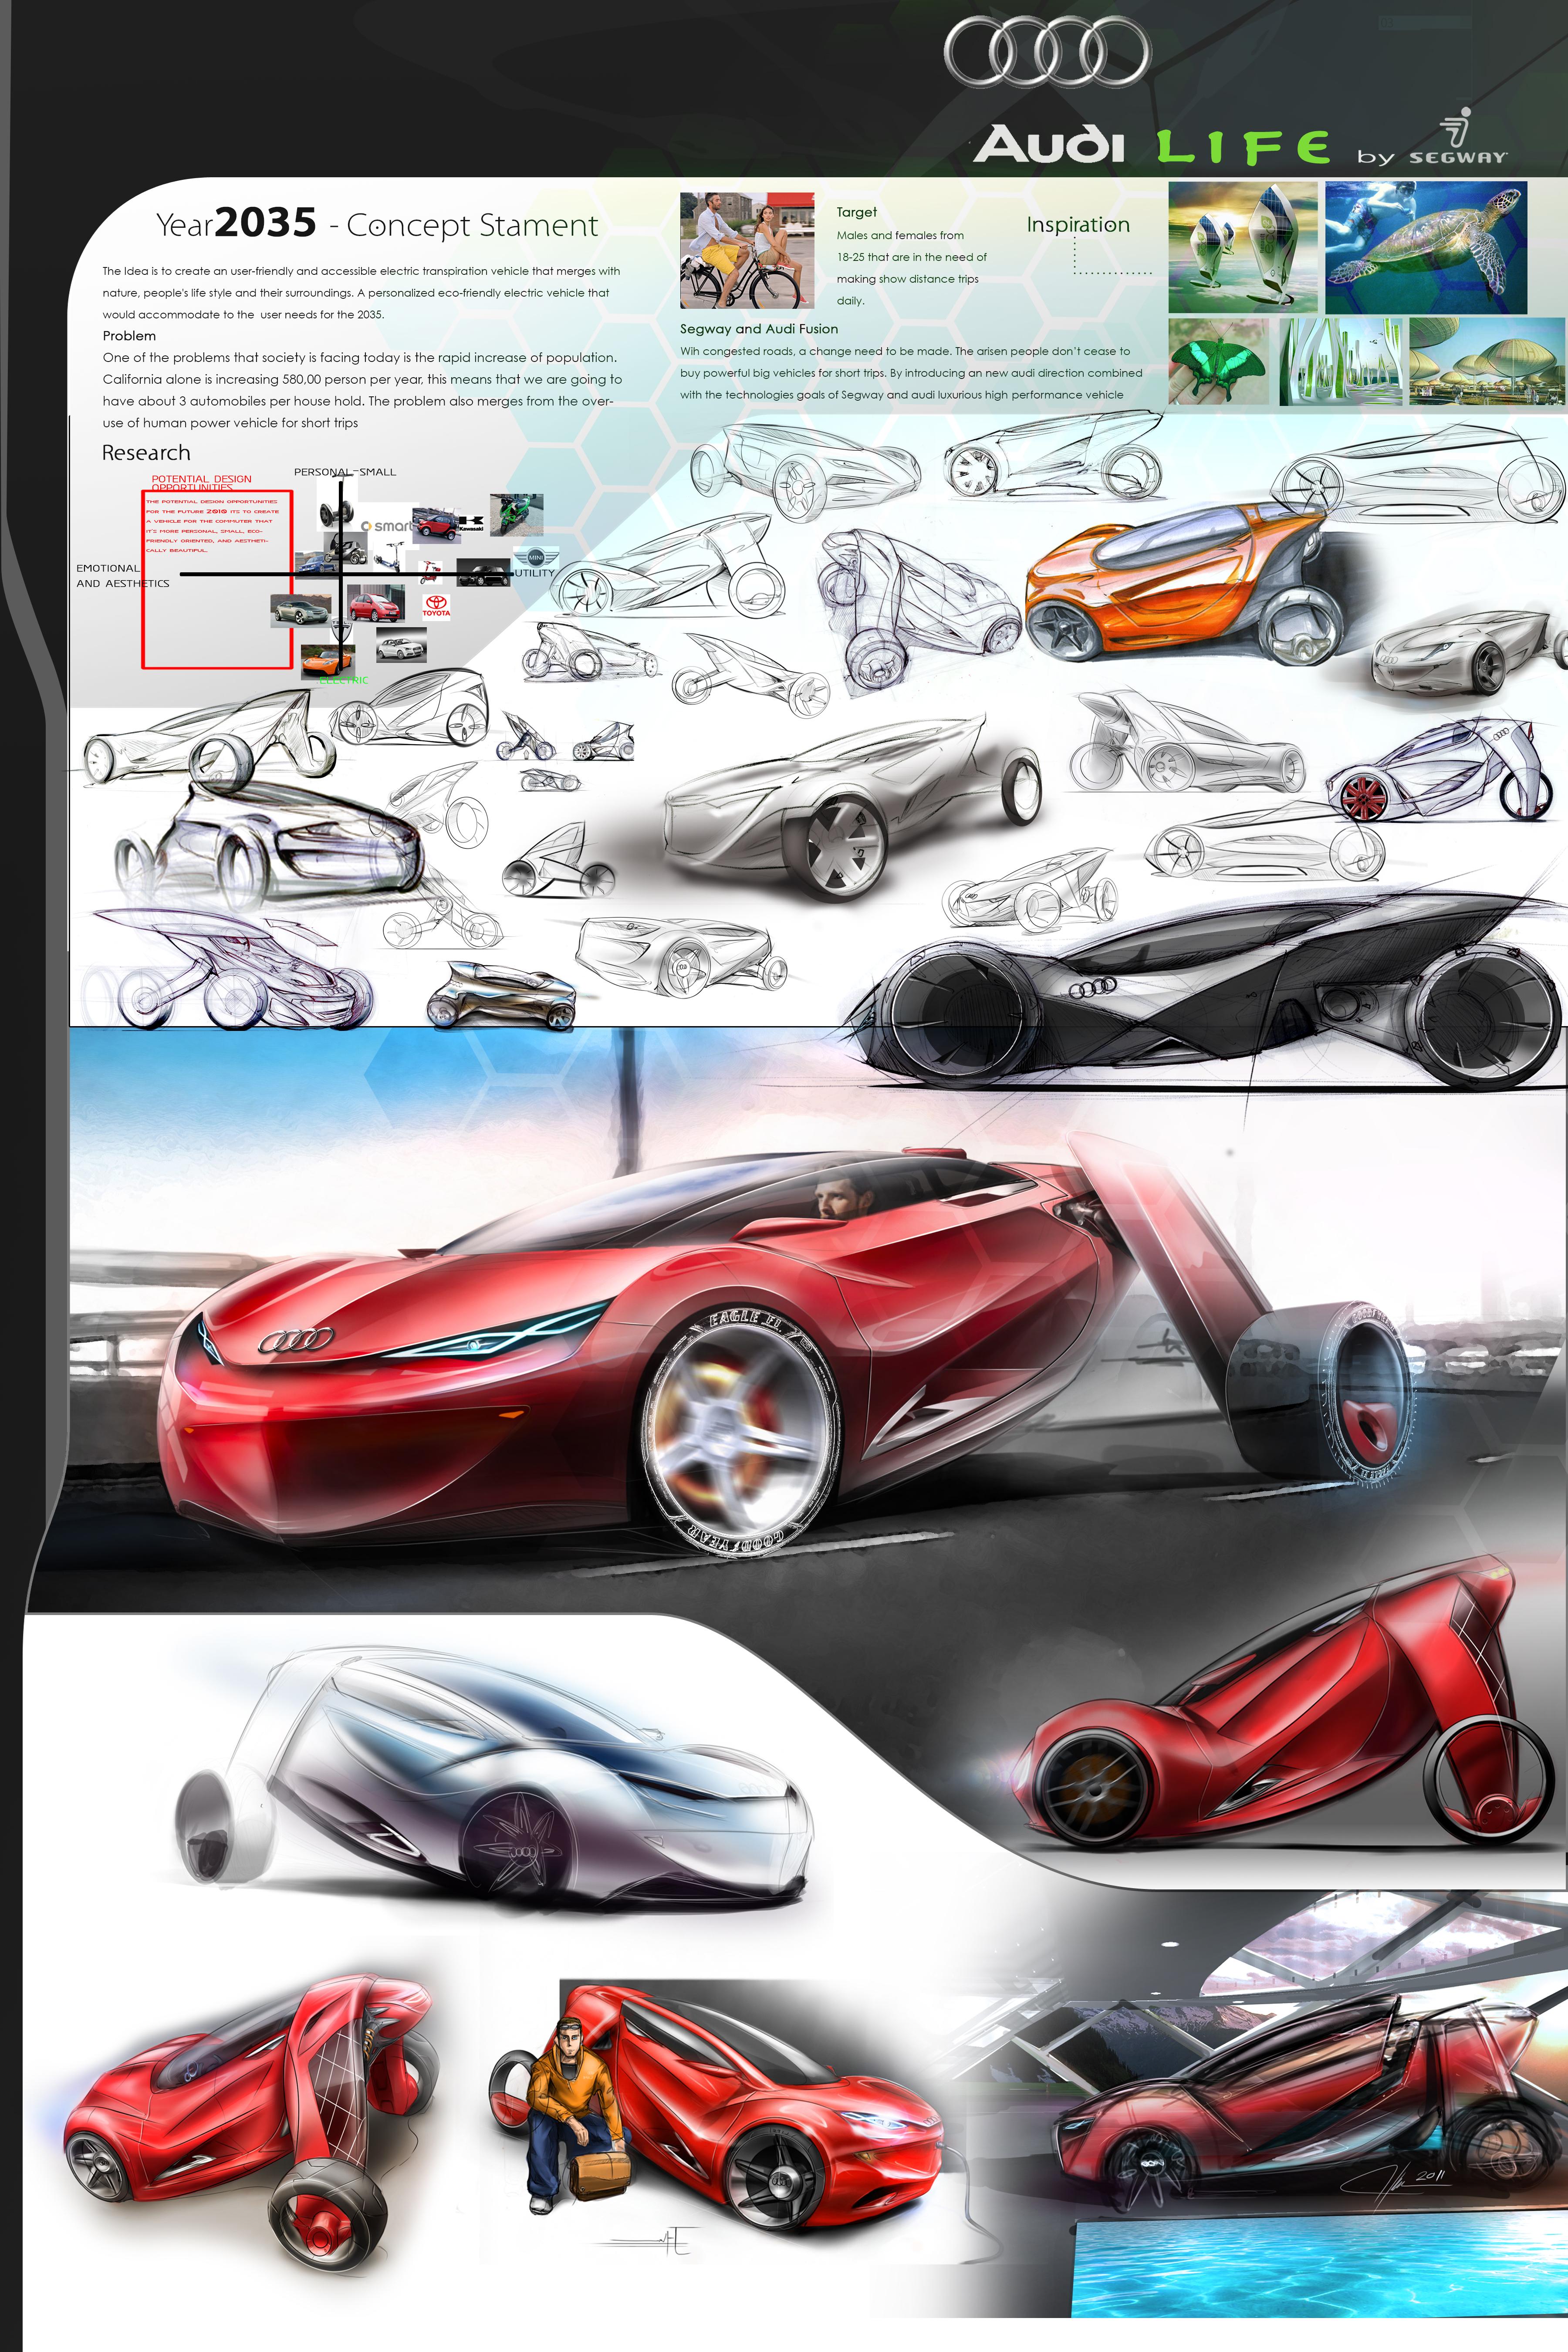 Audi Life By Segway Kique Designs